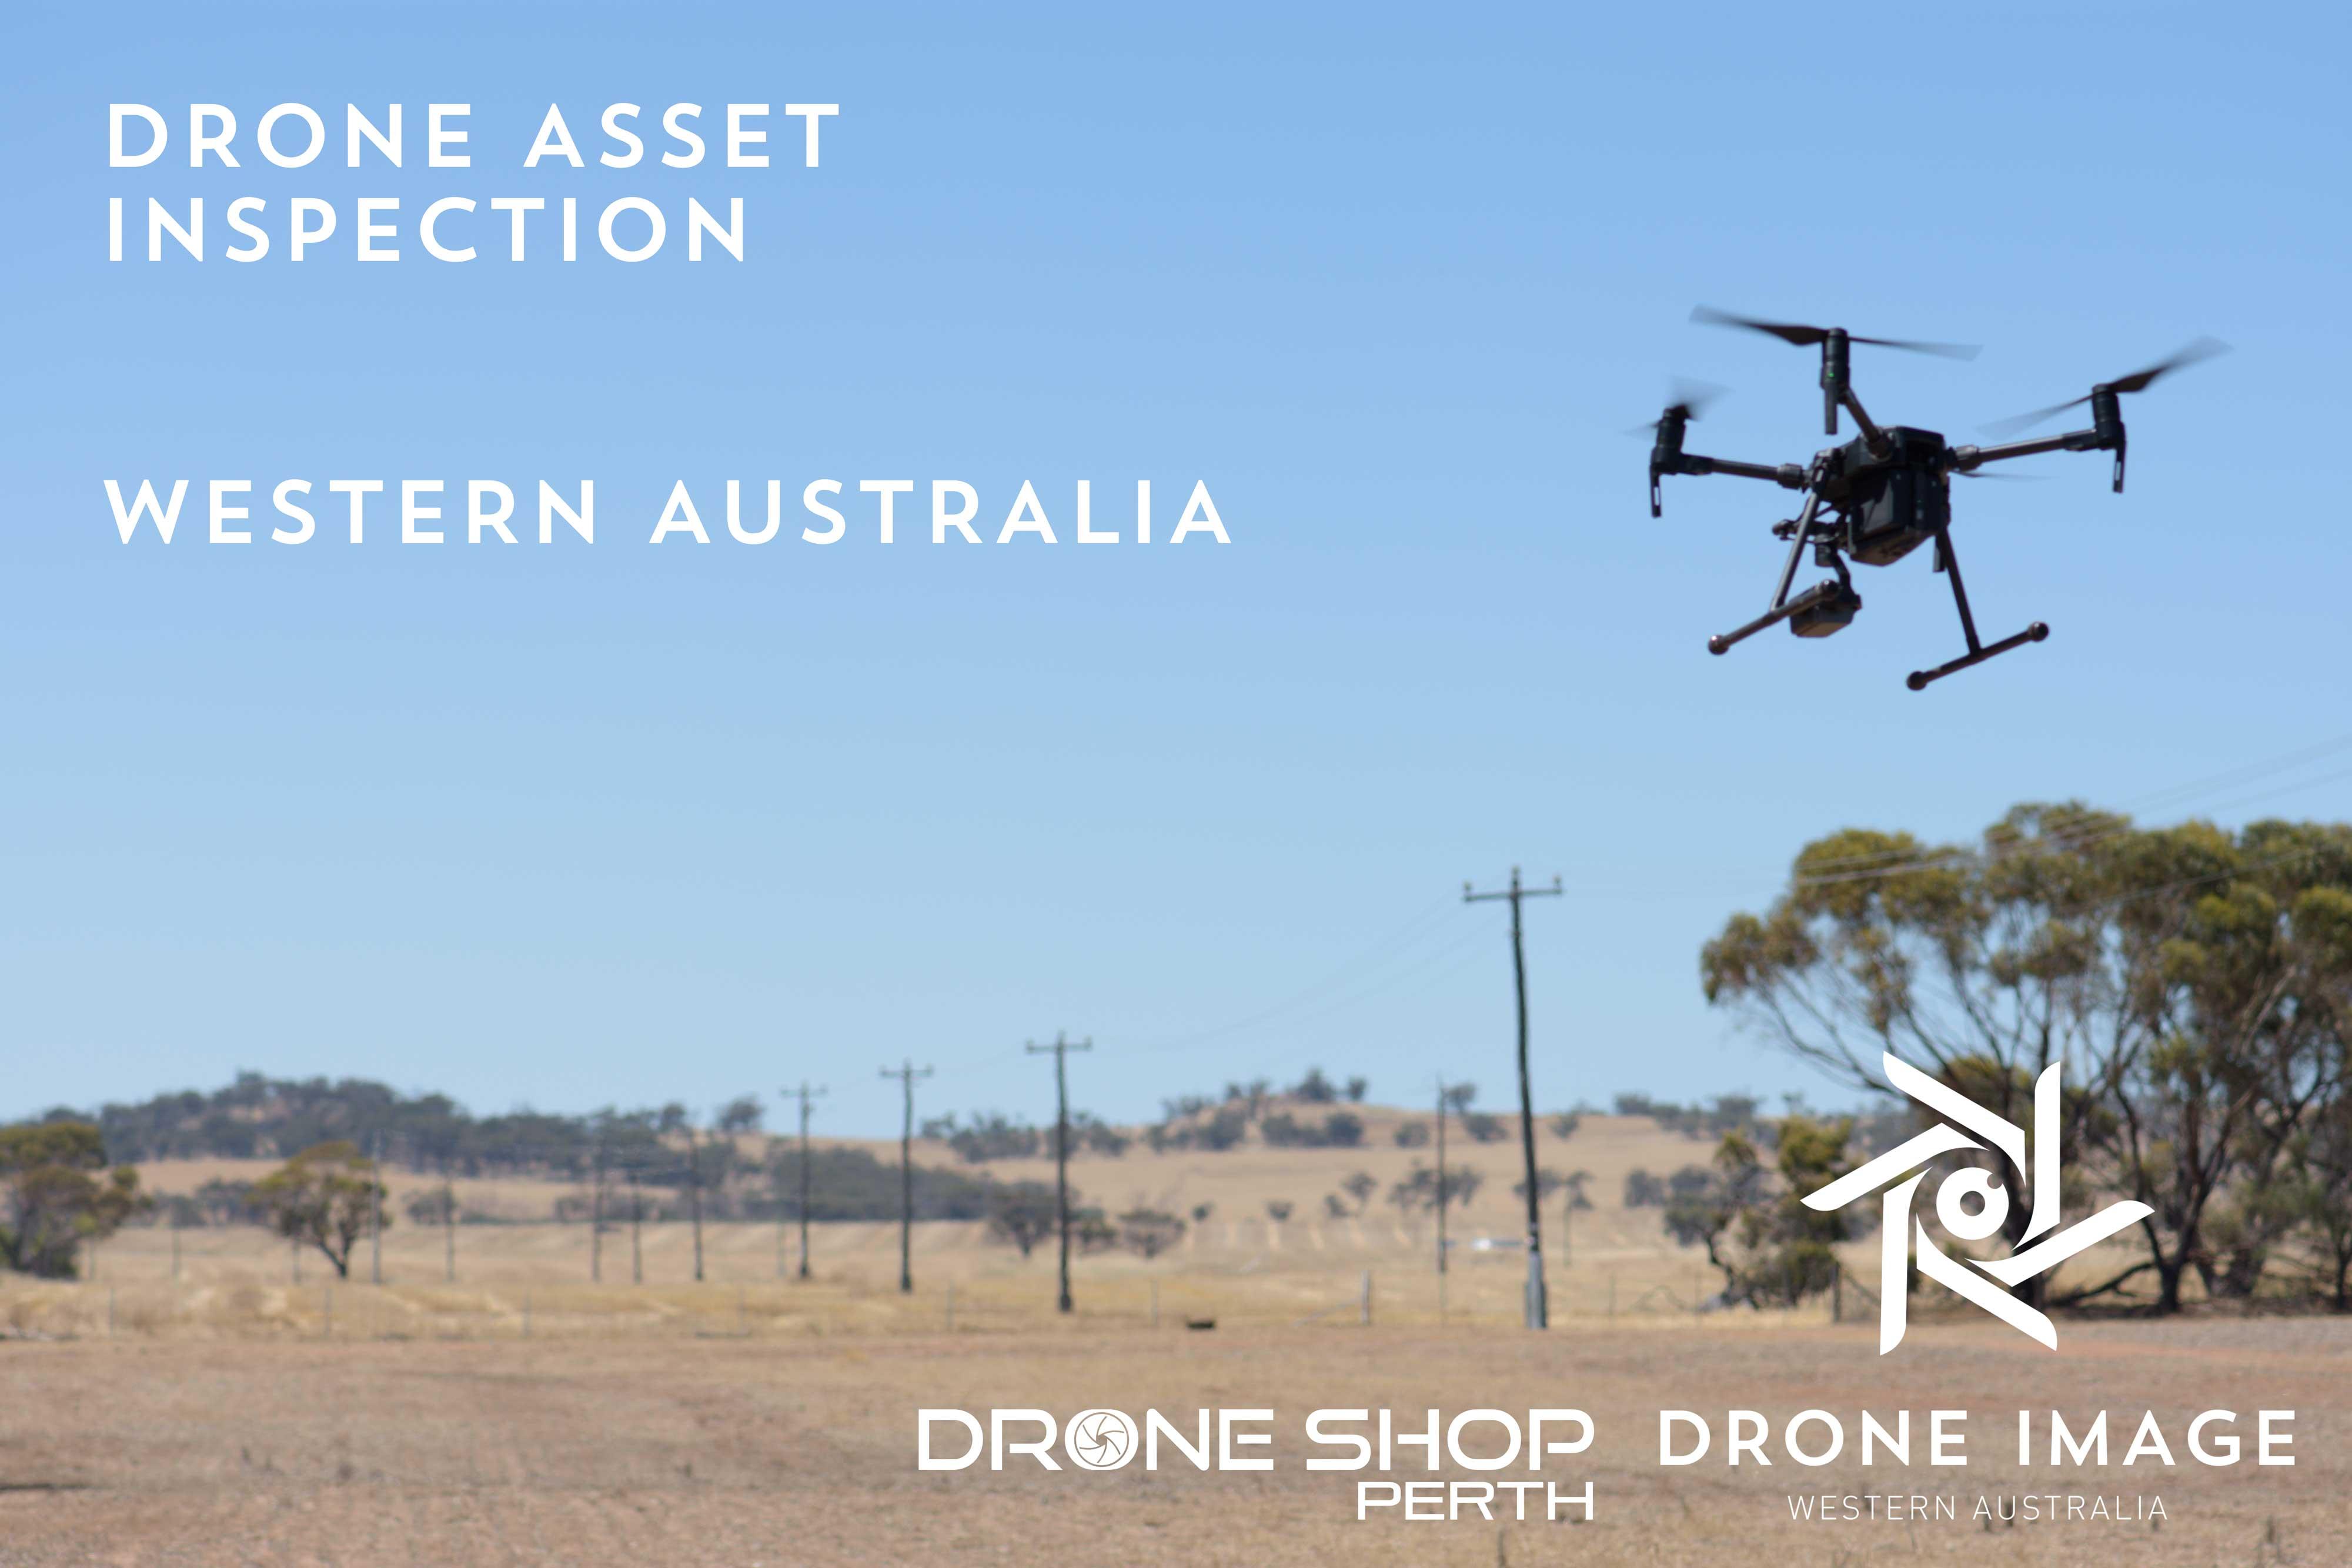 Drone Image Drone Shop Perth Power Line Drone Asset Inspection Western Australia